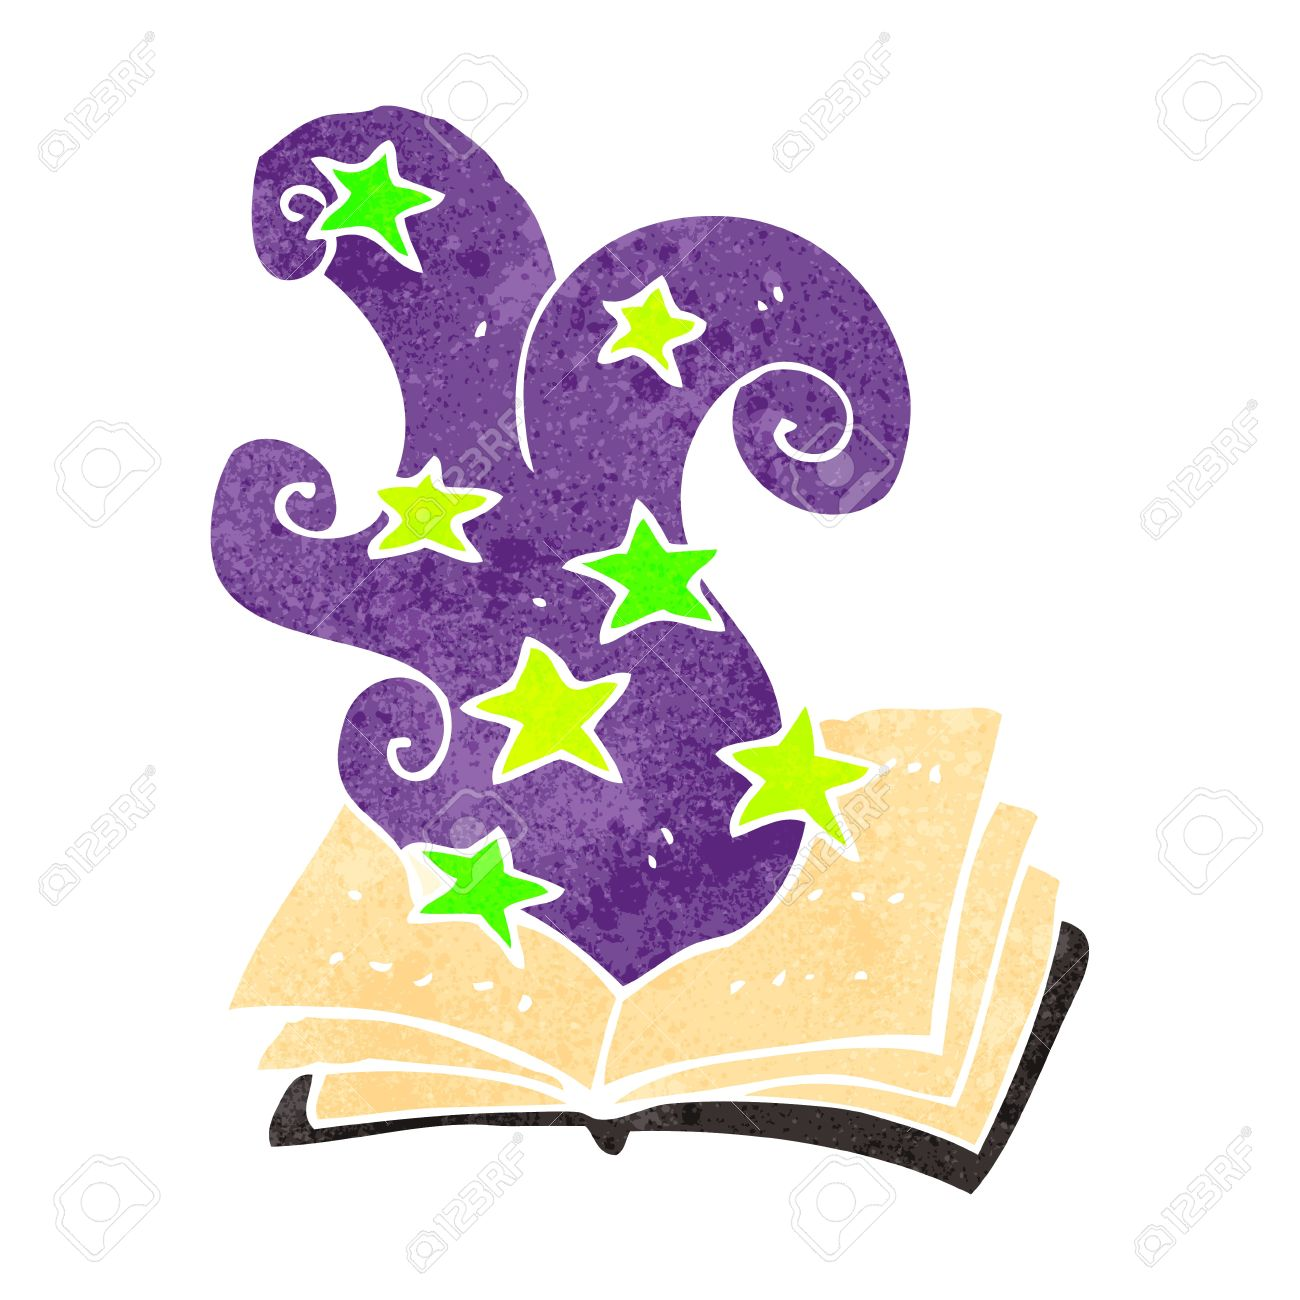 Retro Cartoon Magic Spell Book Royalty Free Cliparts Vectors And Stock Illustration Image 22188060